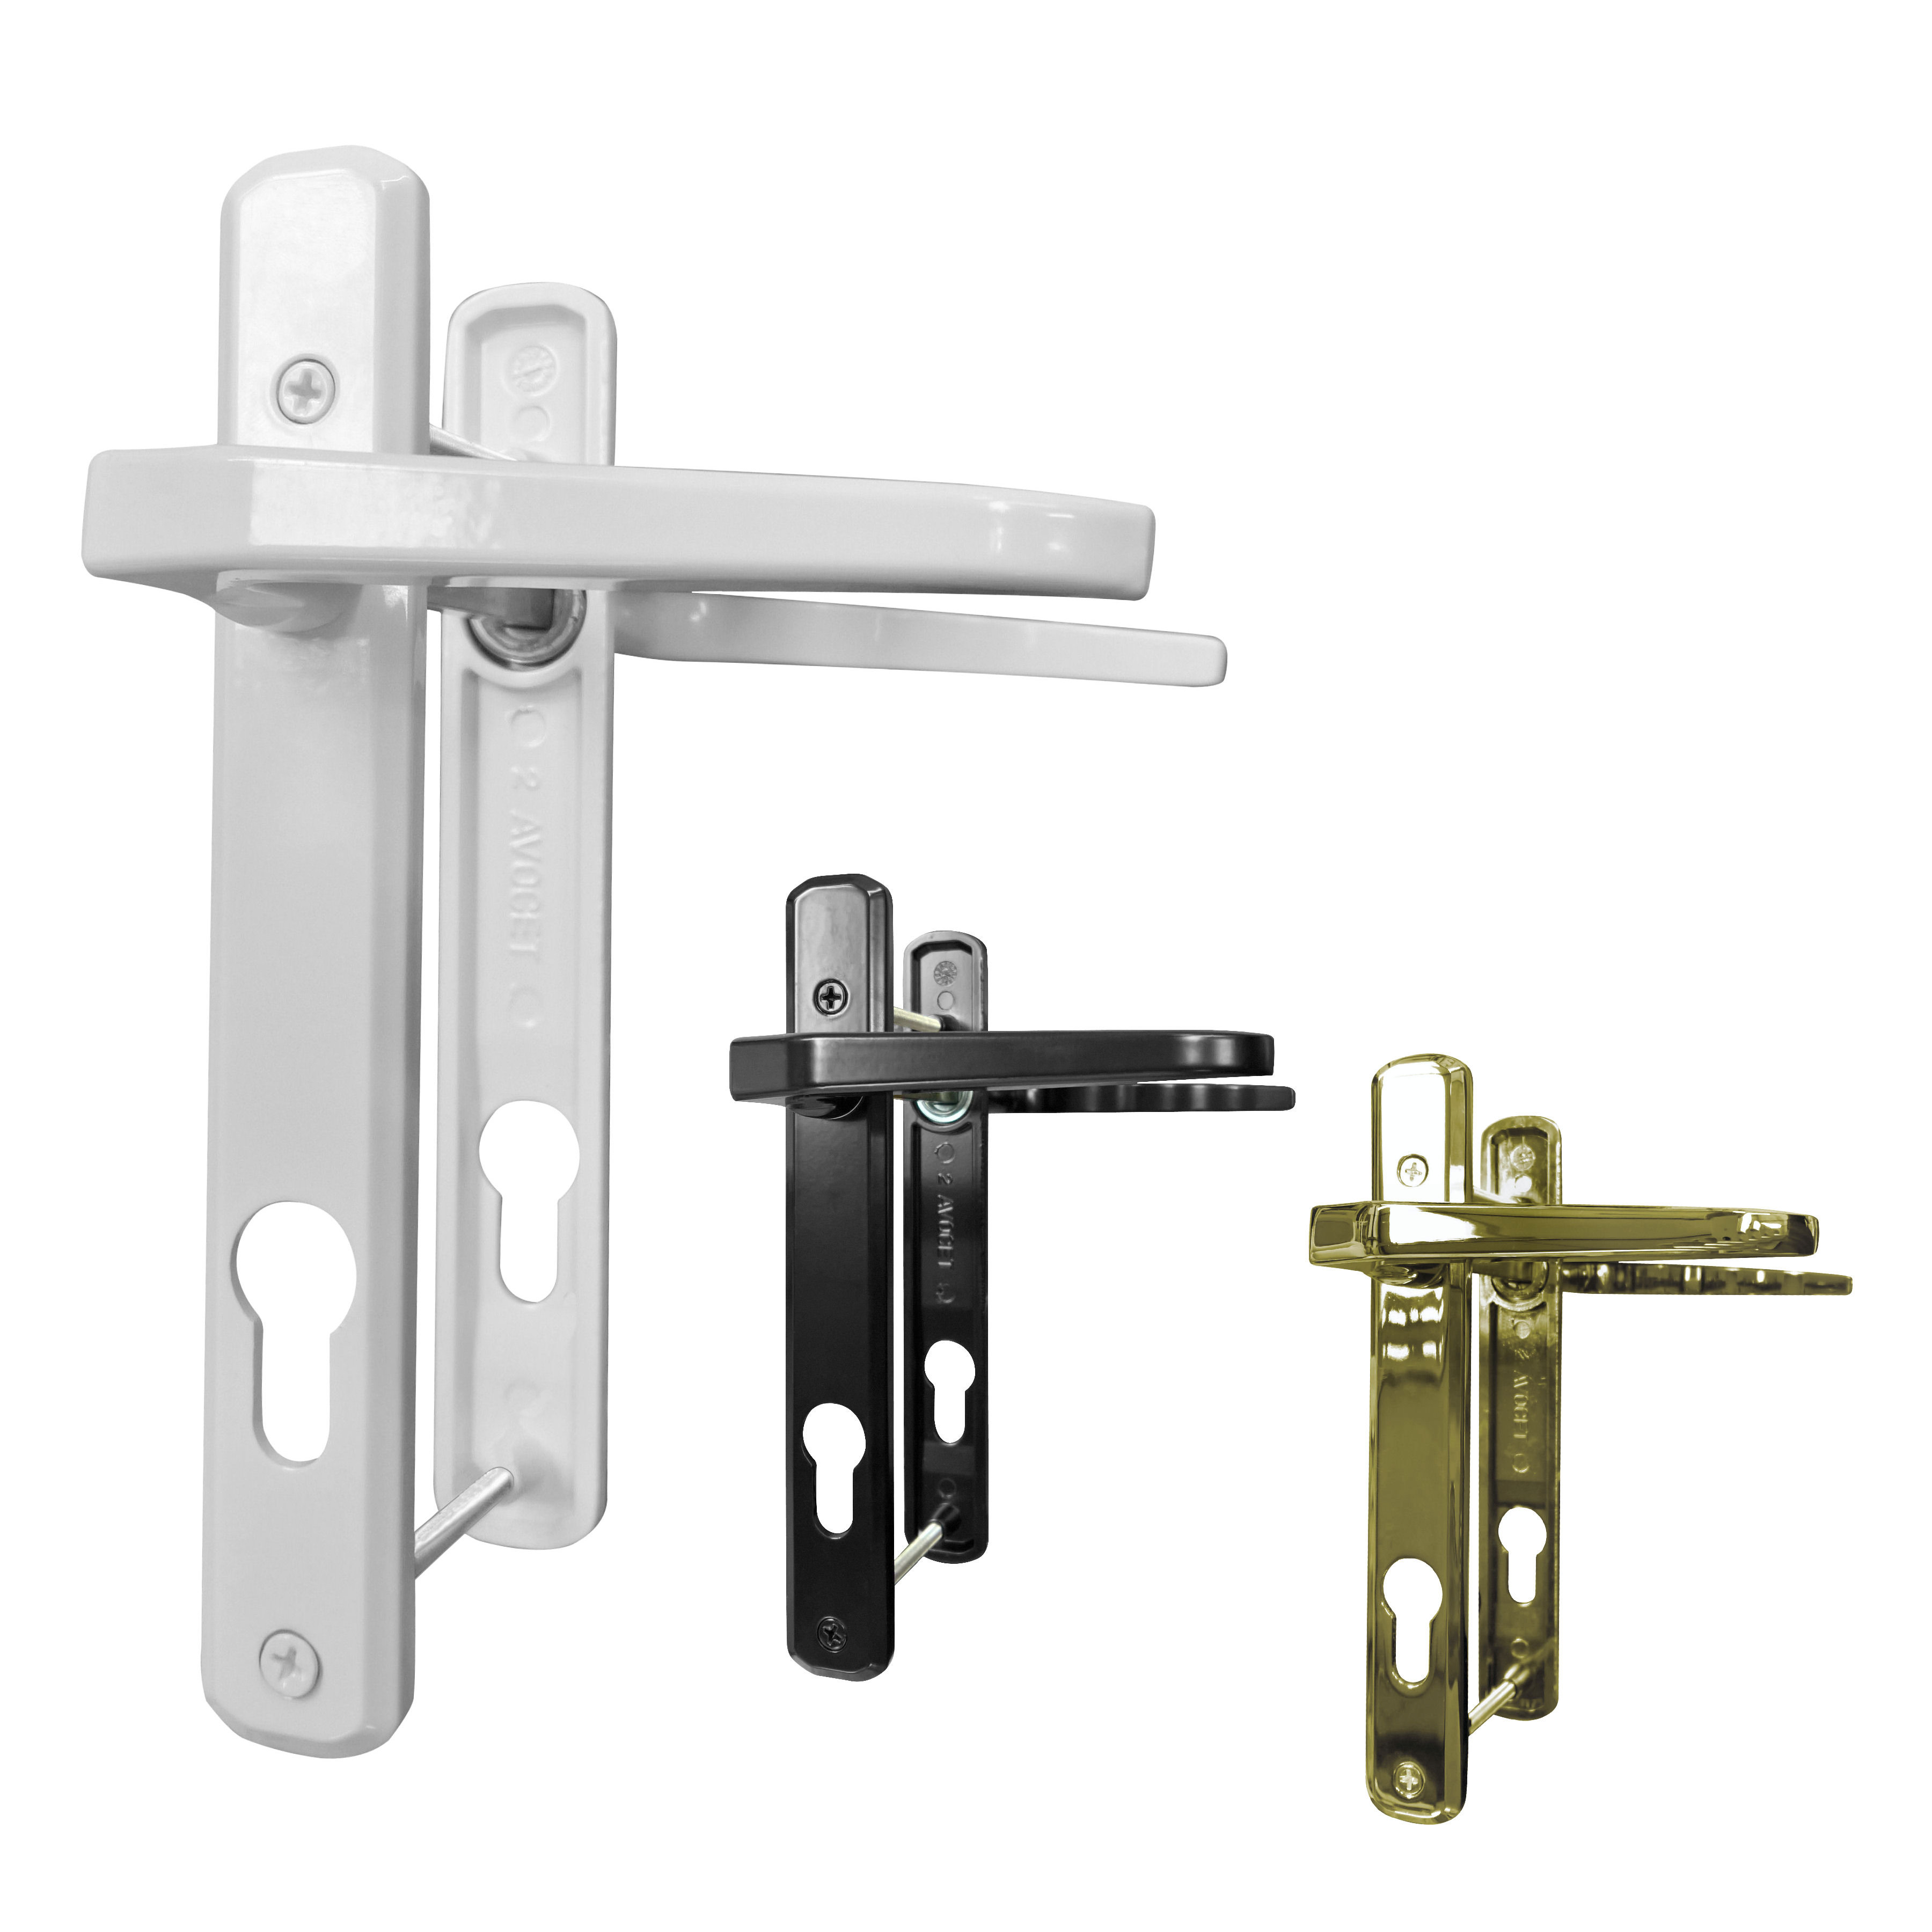 Avocet Roto 92pz Door Handle Set For Upvc Double Glazing